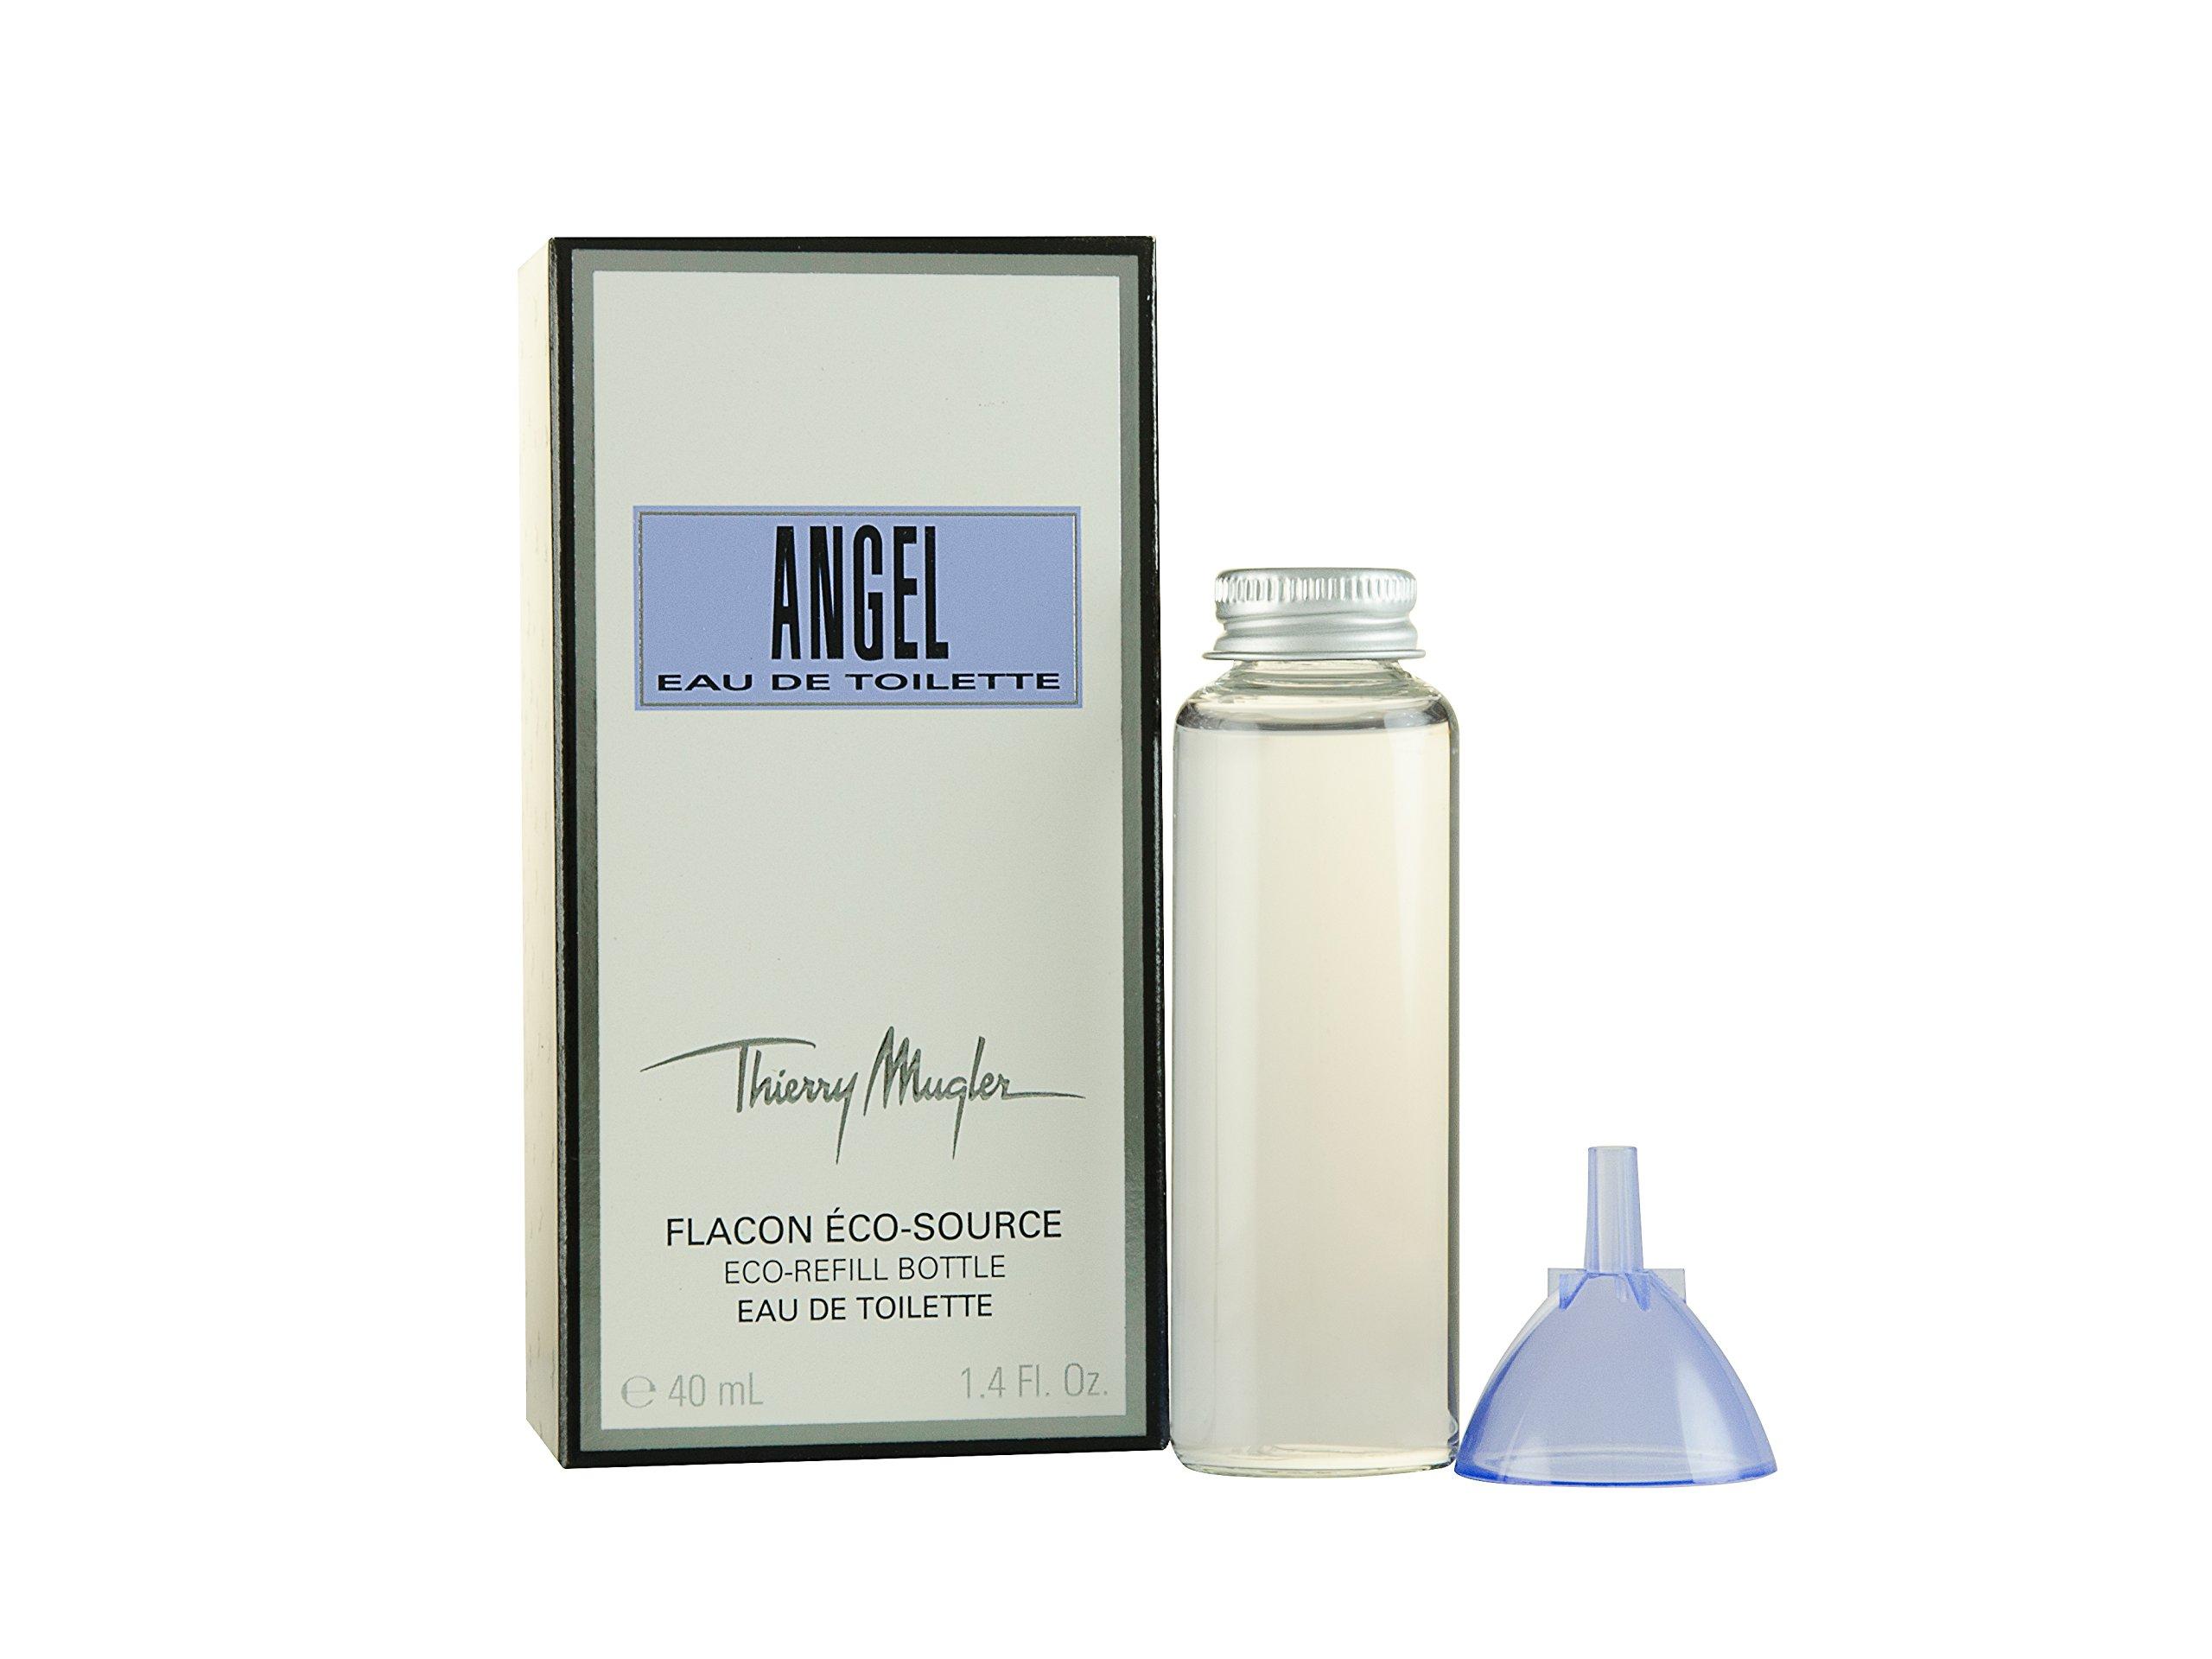 Thierry Mugler Angel Eau de Toilette for Women (Eco Refill Bottle), 1.4 Ounce by Thierry Mugler (Image #1)